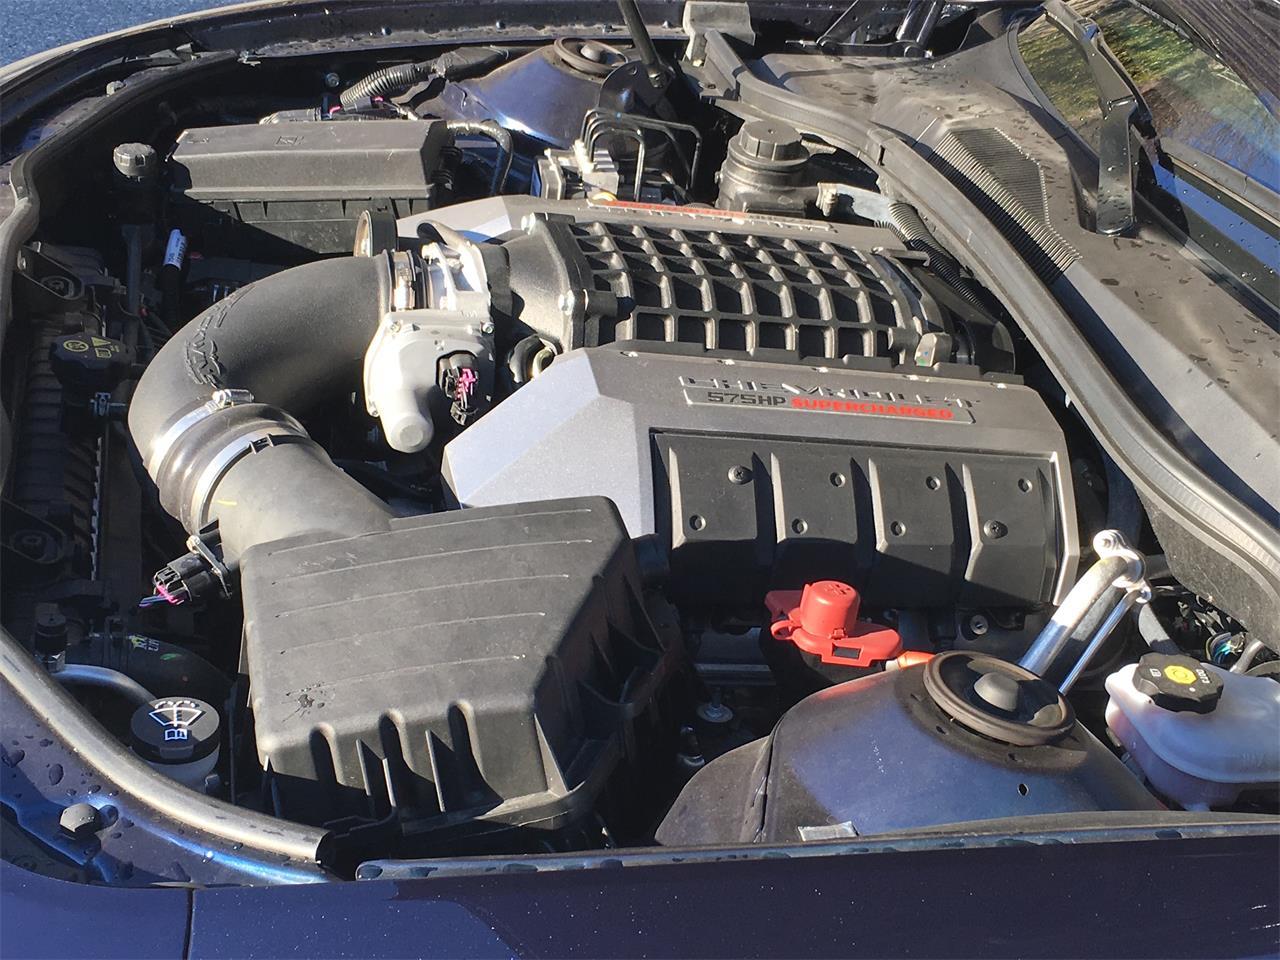 2010 Chevrolet Camaro (CC-1193706) for sale in Sumas, Washington